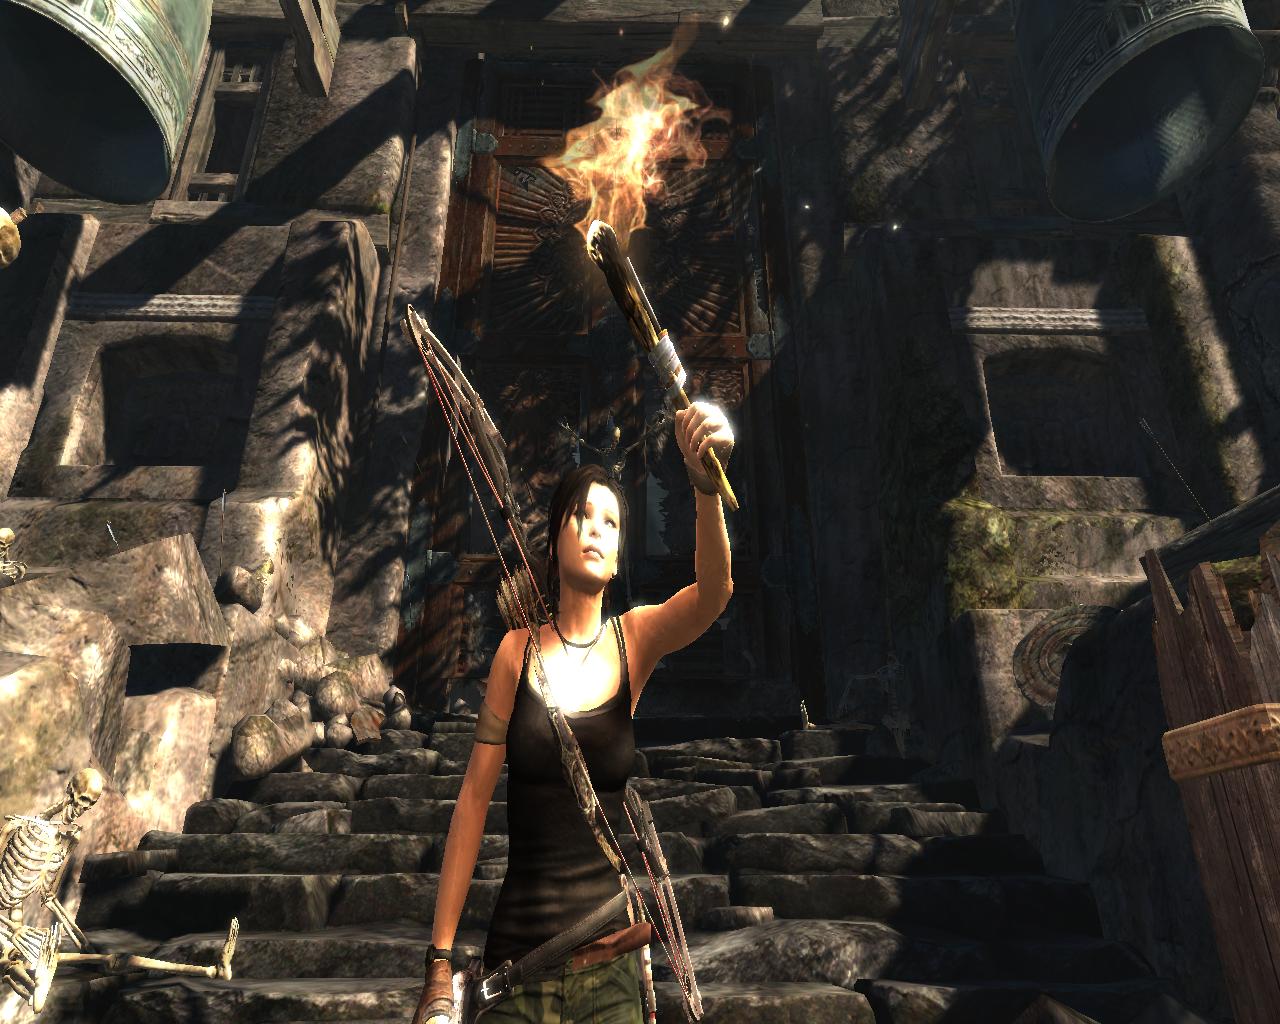 Tomb raider 2013 mods